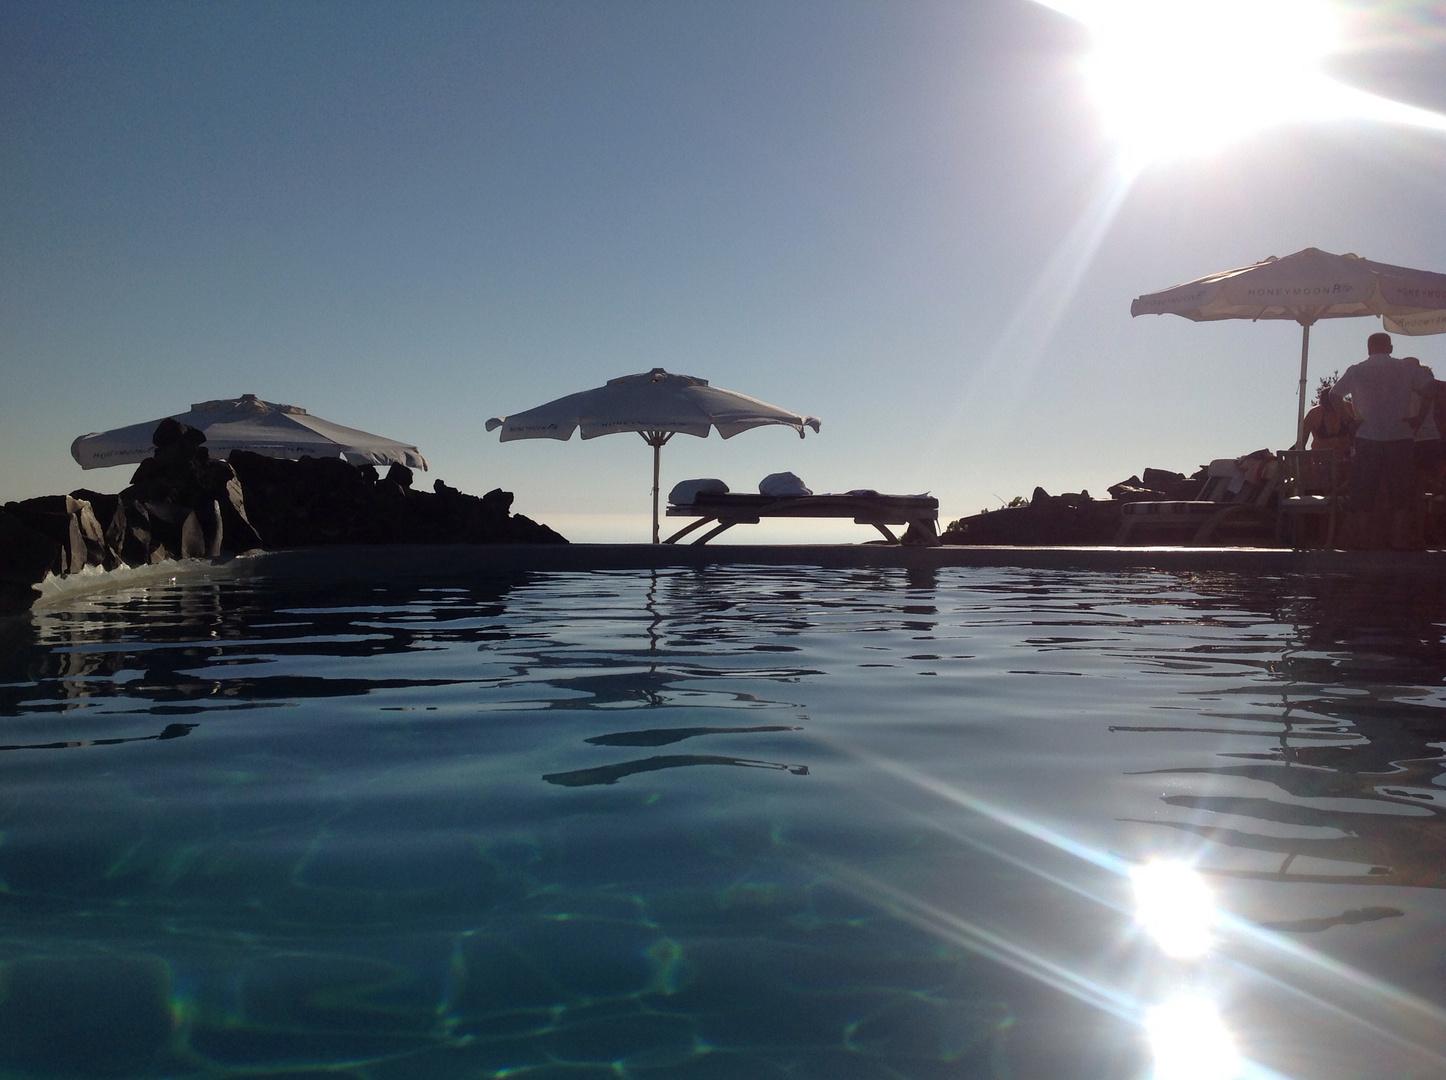 Honymoonhotel und Sonne satt in Santorini